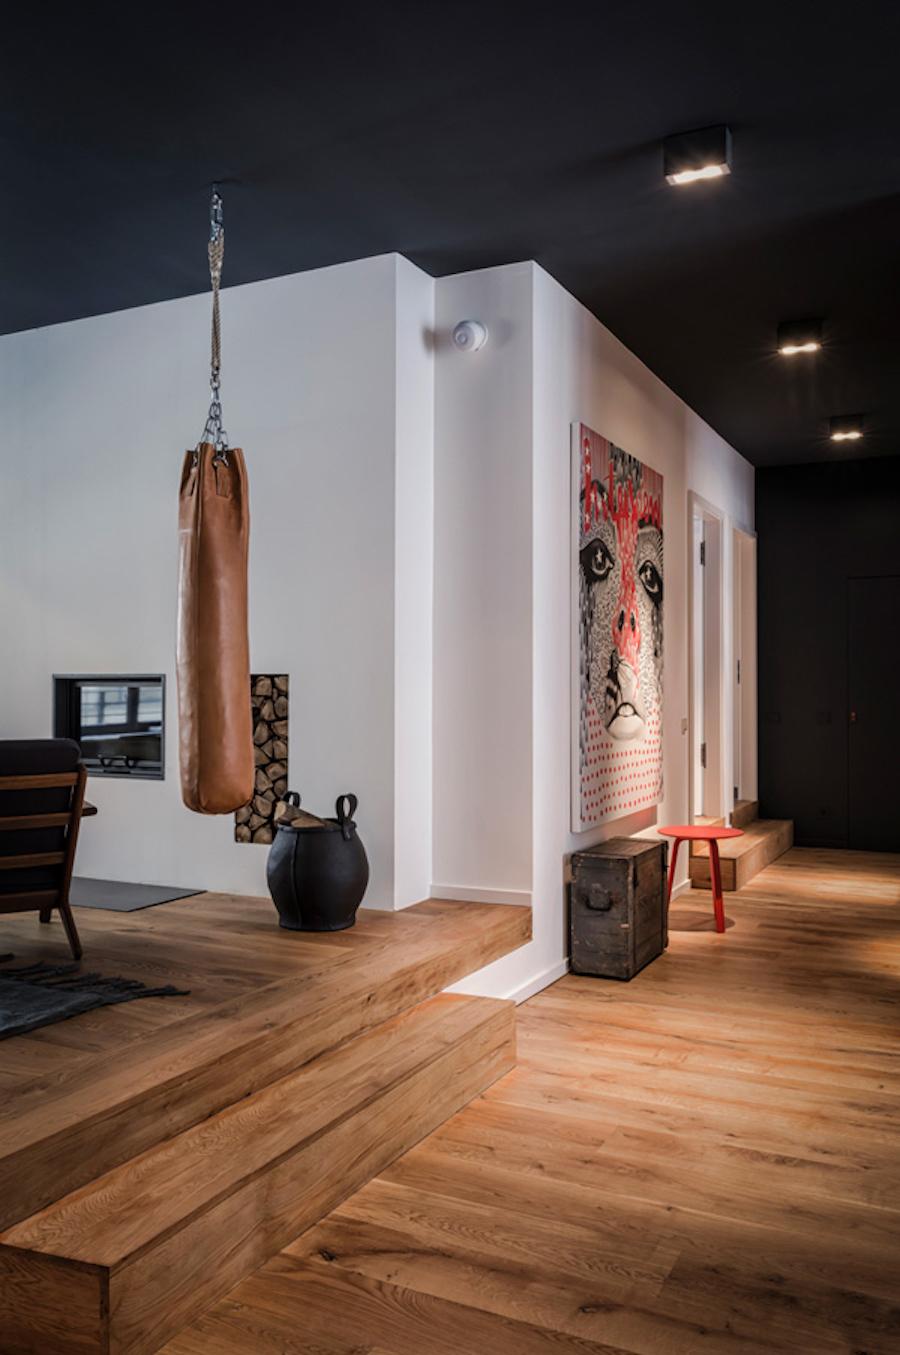 plafond noir appartement masculin décoration masculine - blog déco - clem around the corner